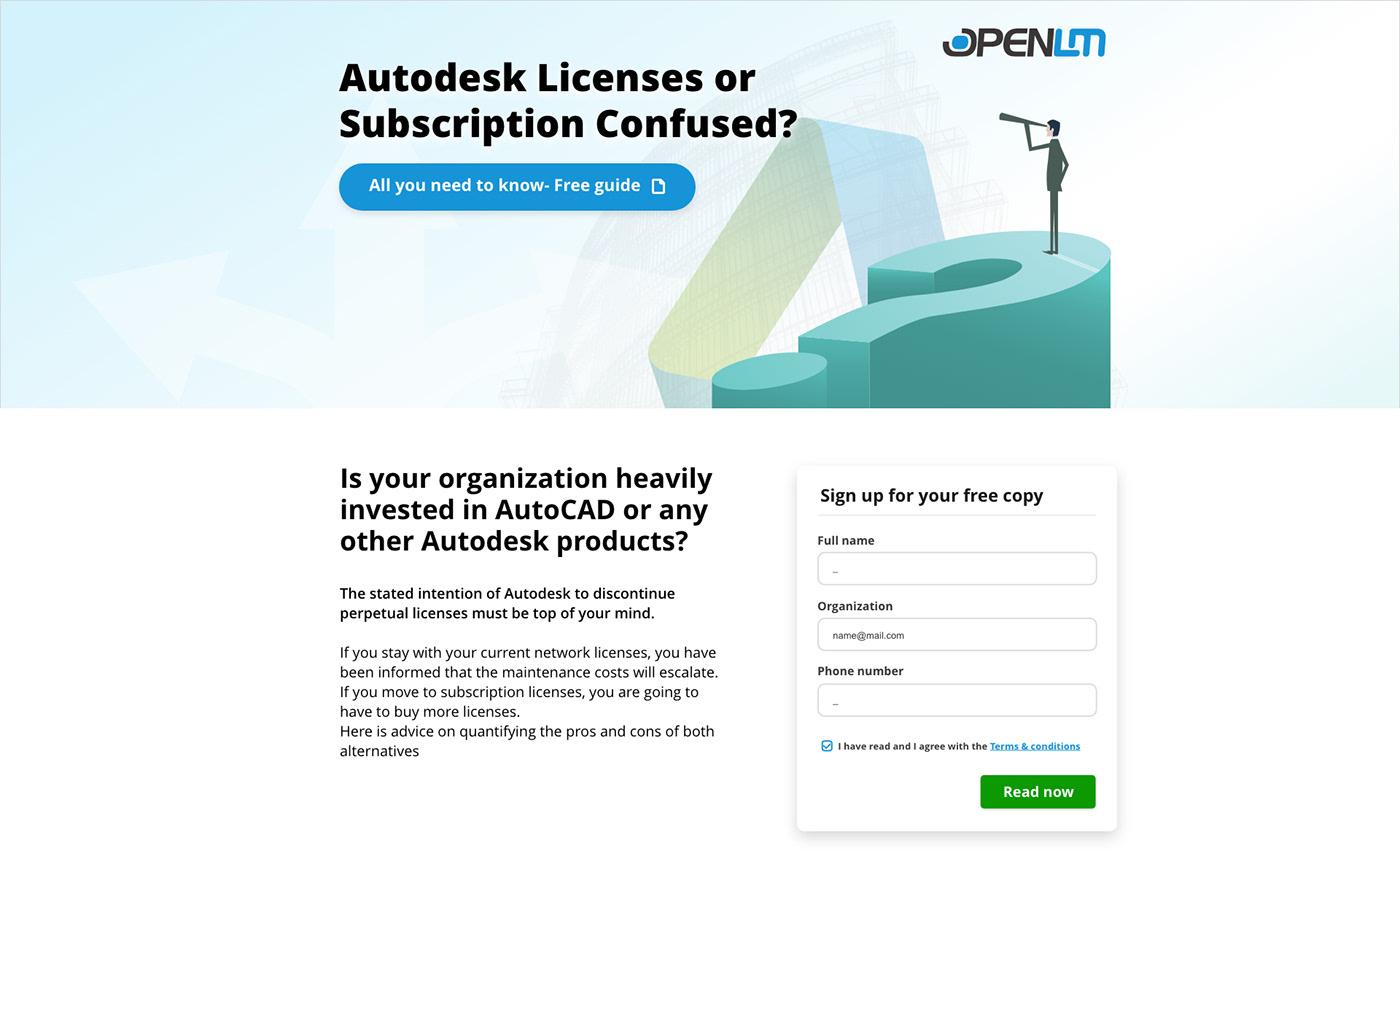 Adobe XD landin page ux/ui design